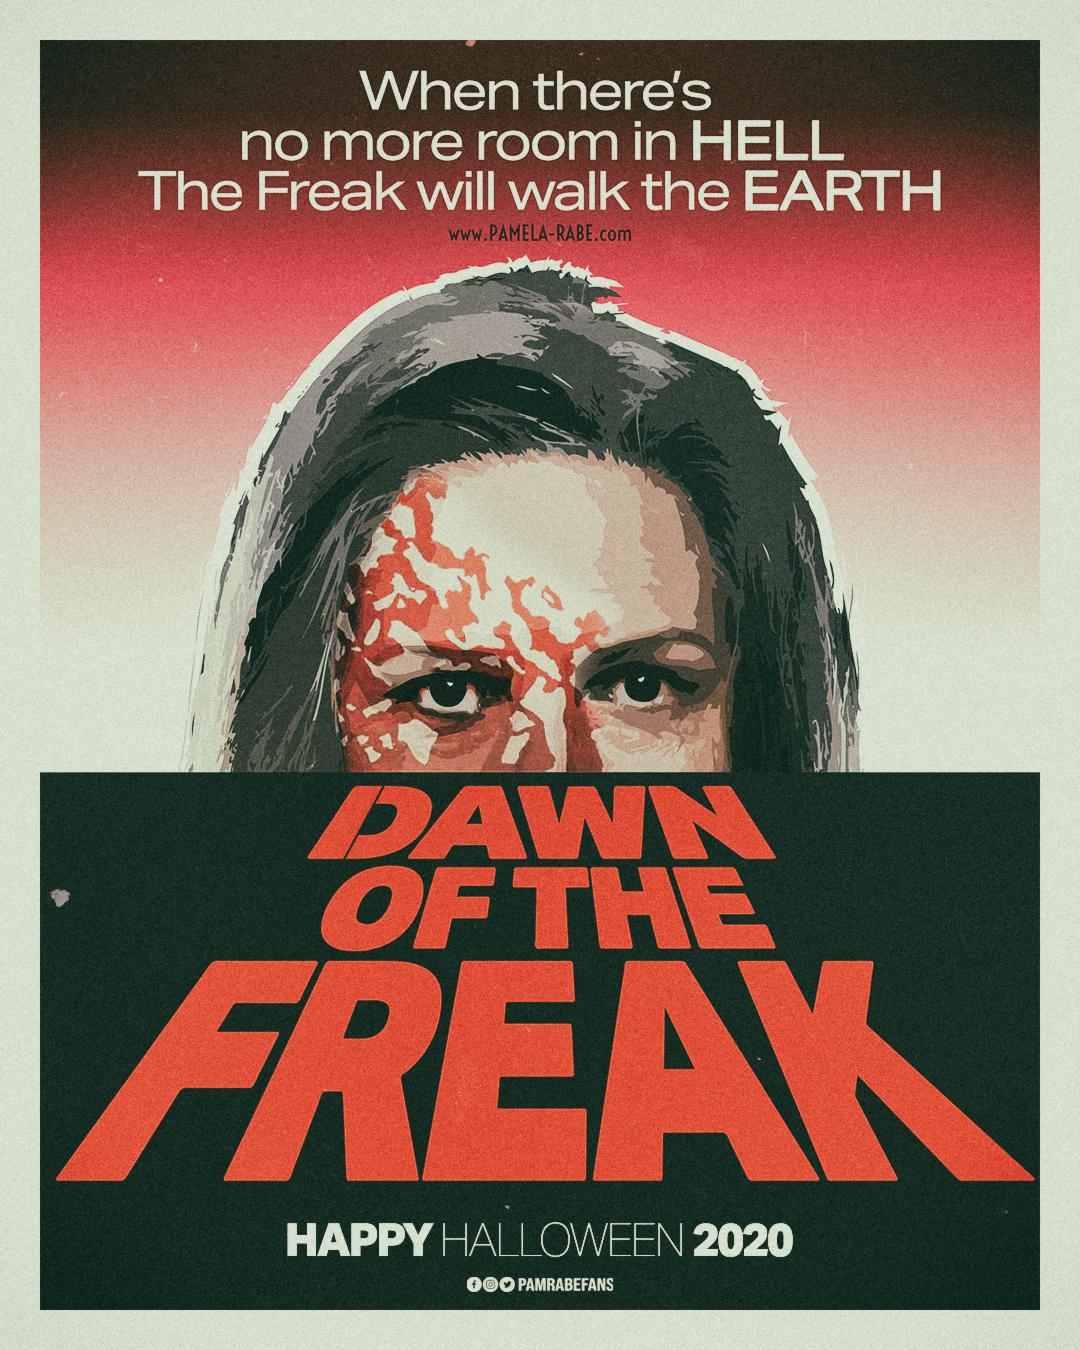 Pamela Rabe / Joan Ferguson Halloween Edit 2020